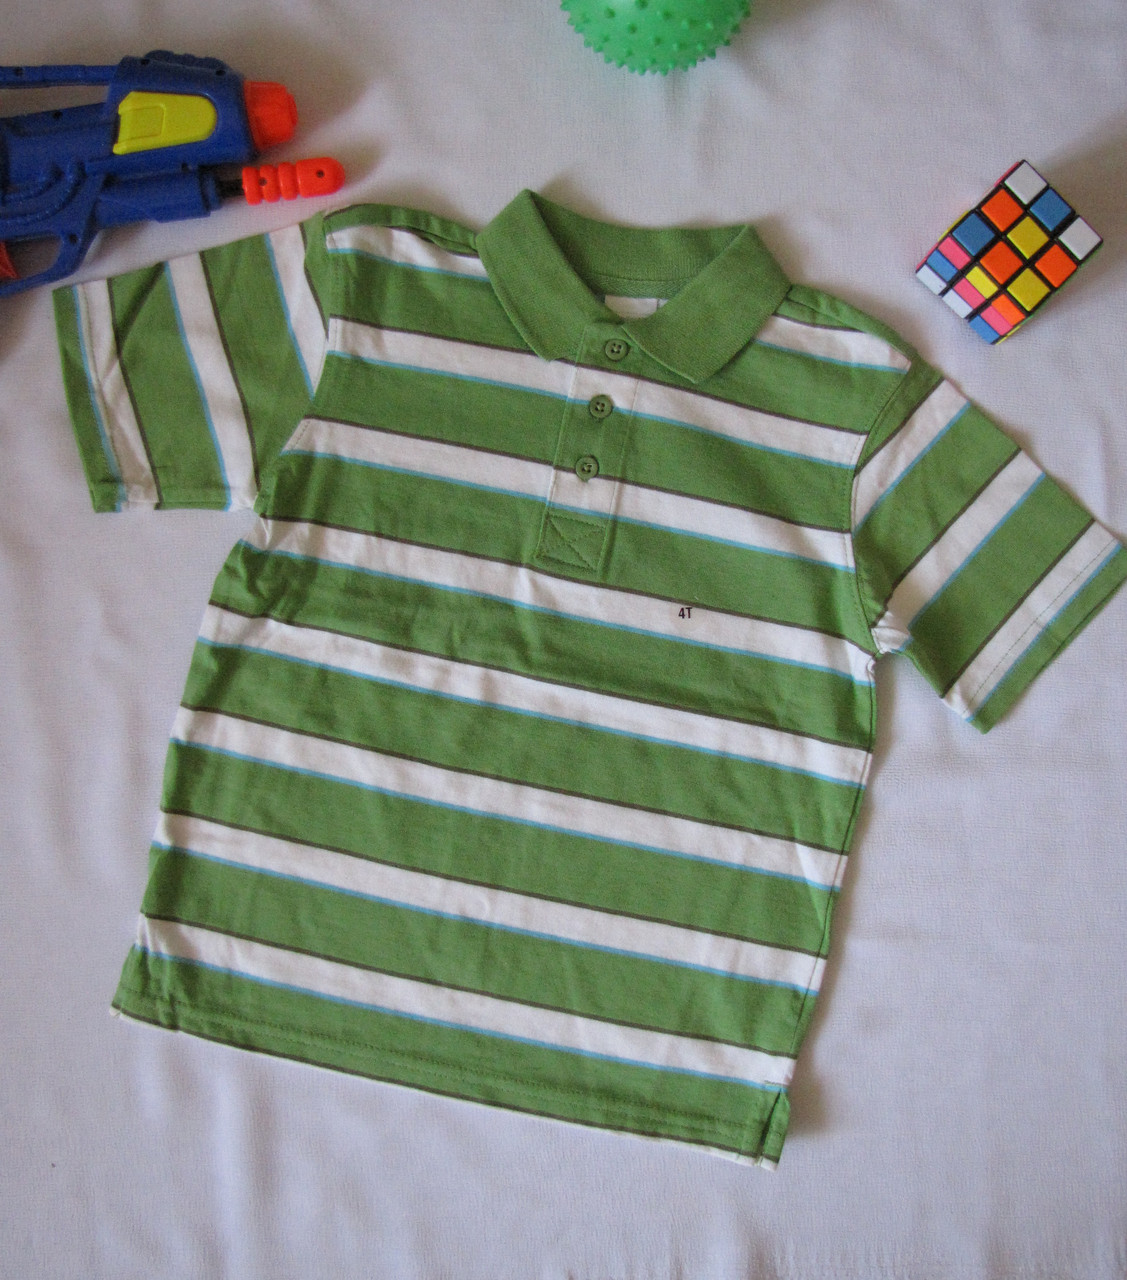 Футболка поло Wonder Kids оригинал рост 104 см зеленая 07121